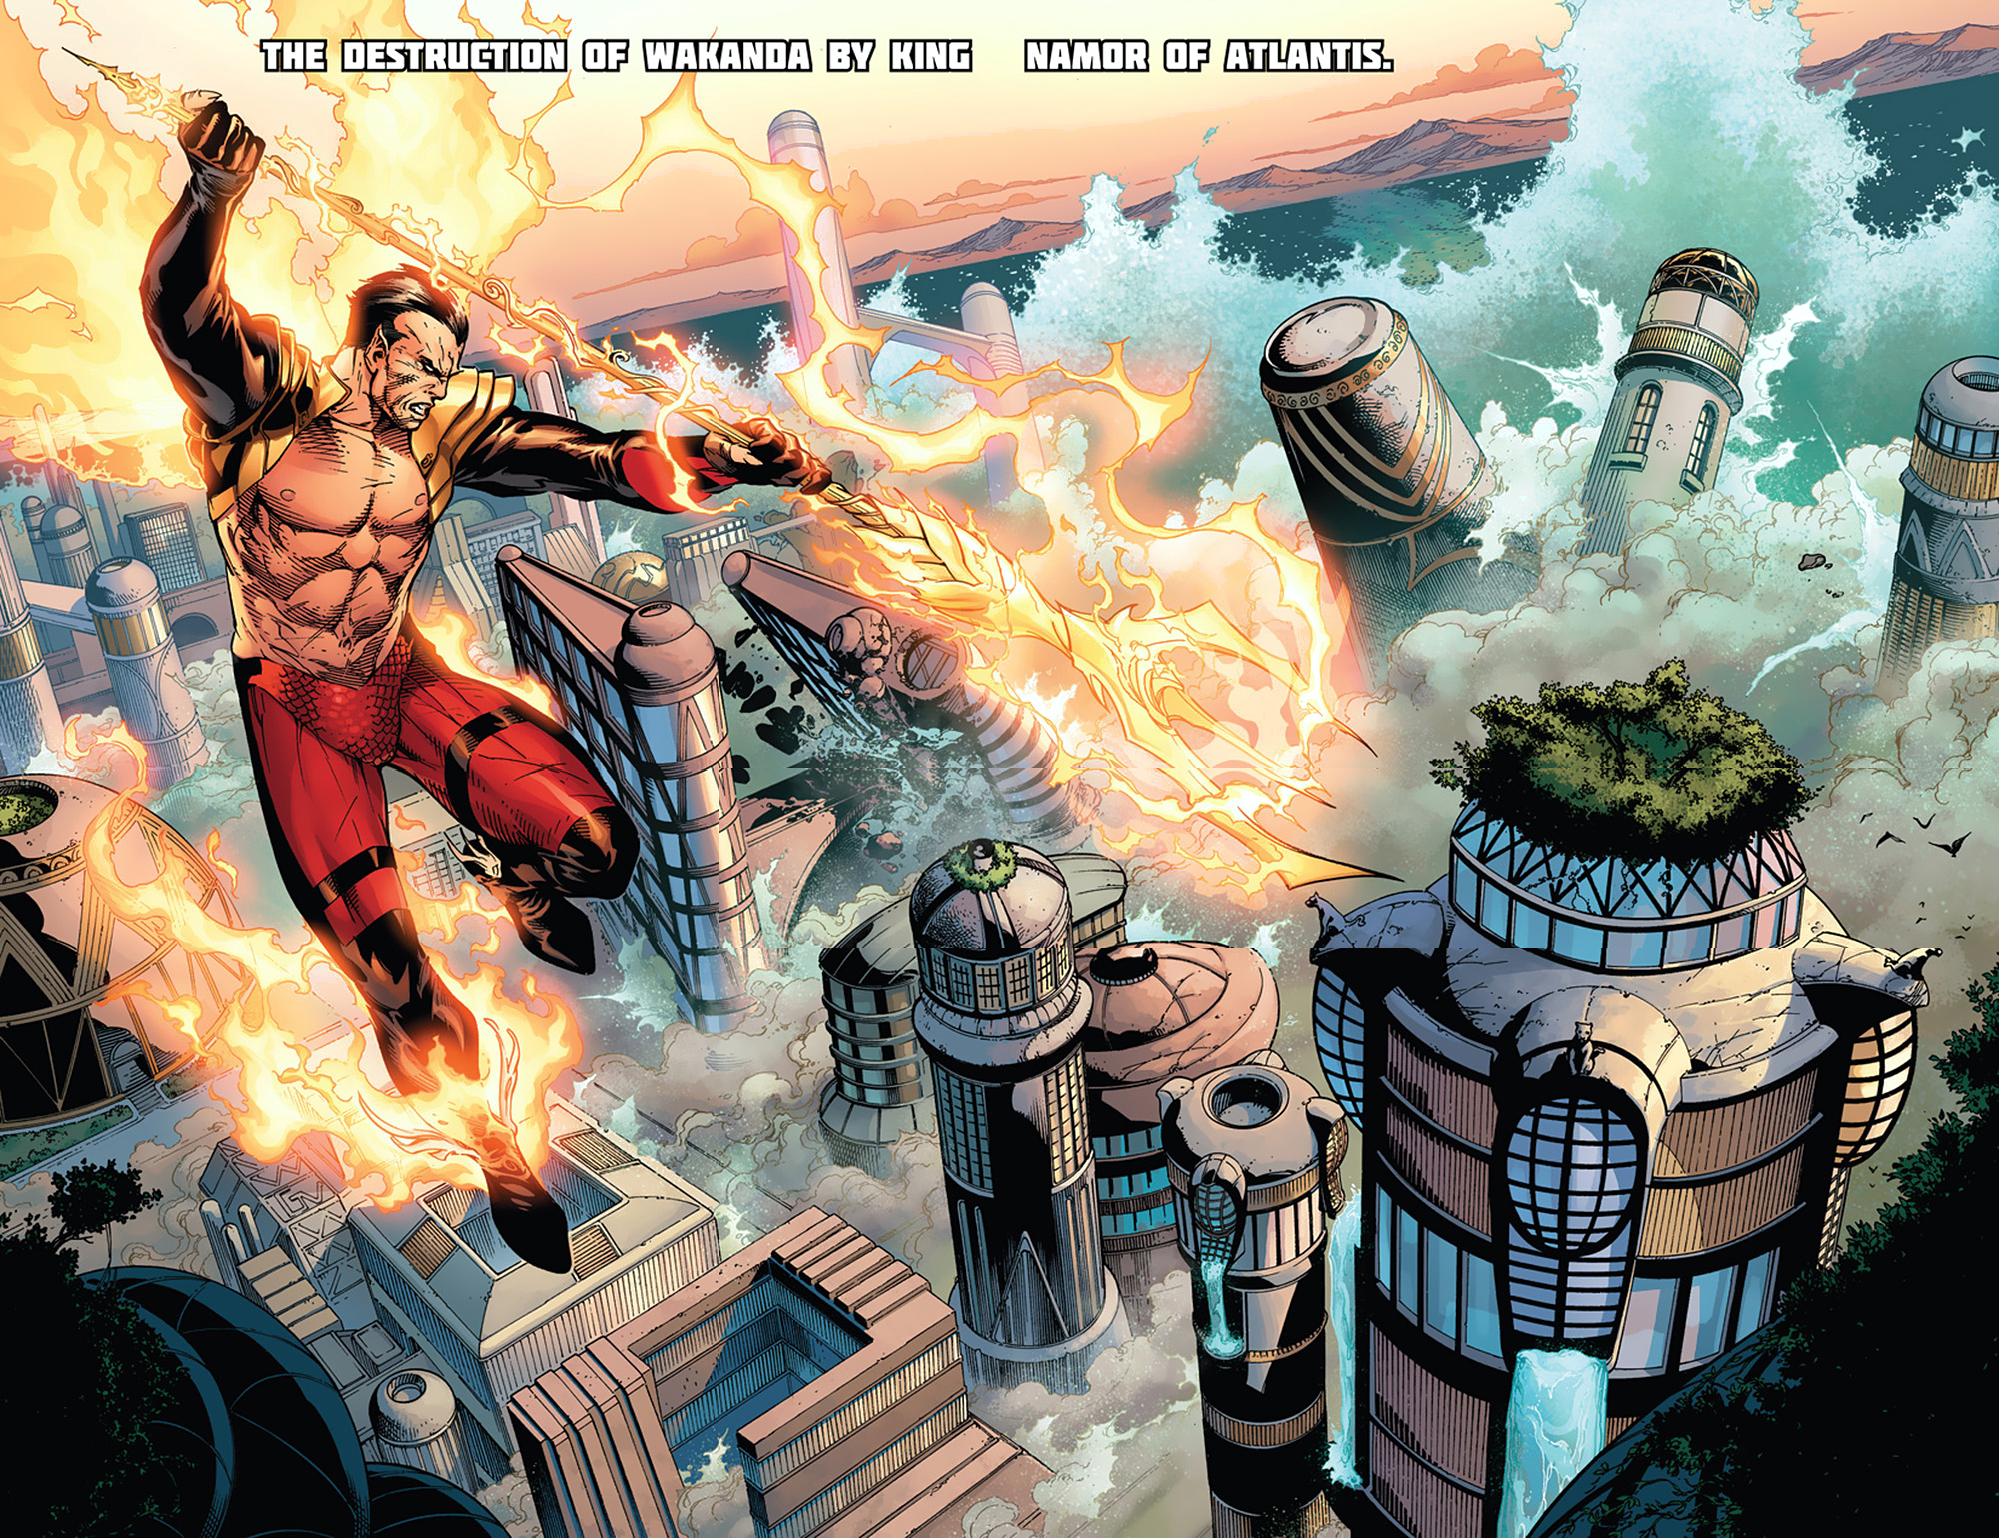 phoenix-five-namor-destroys-wakanda-1.jpg